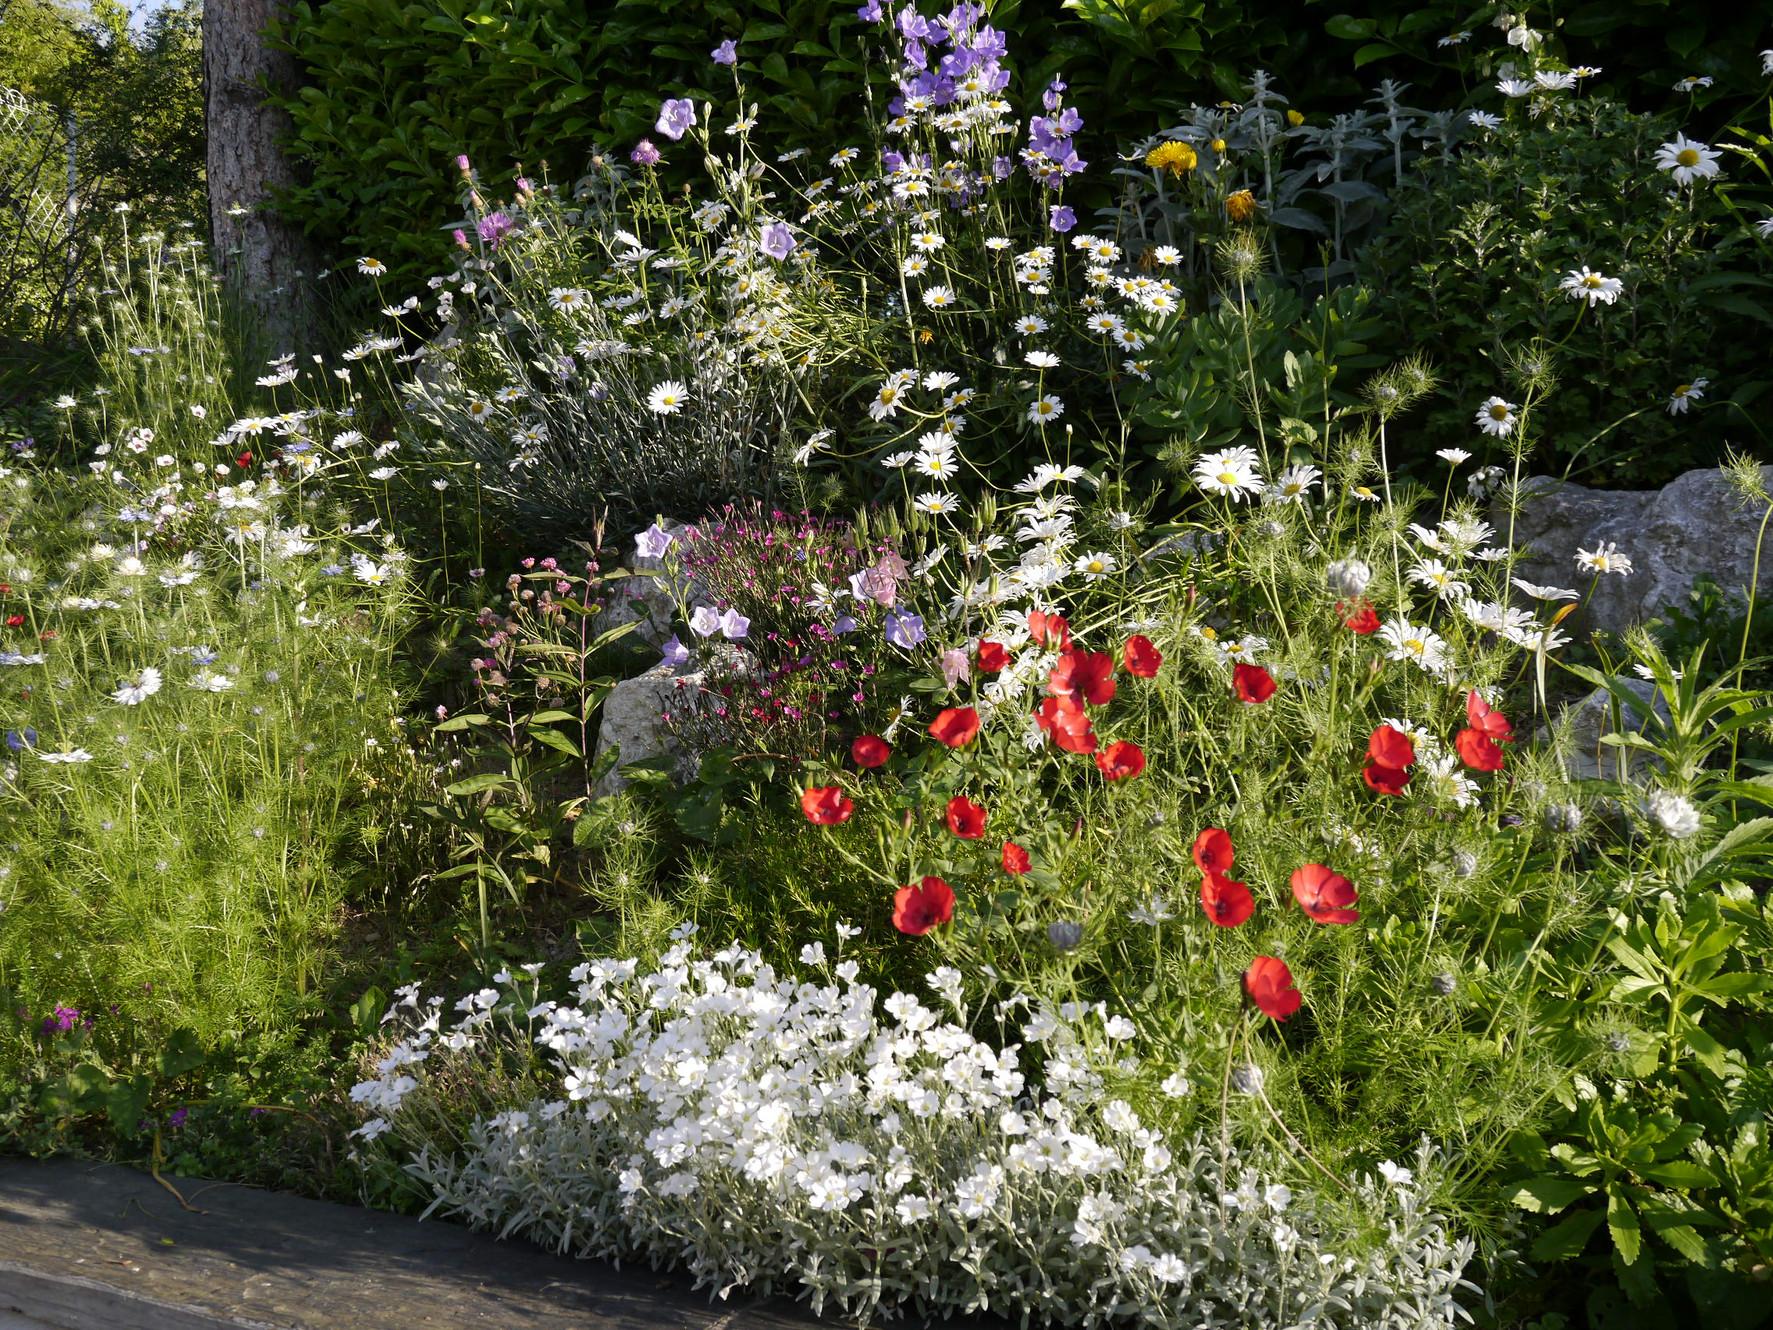 Dry Stone Patio Gardens Ardeche Gard Vaucluse Nr Landscaping